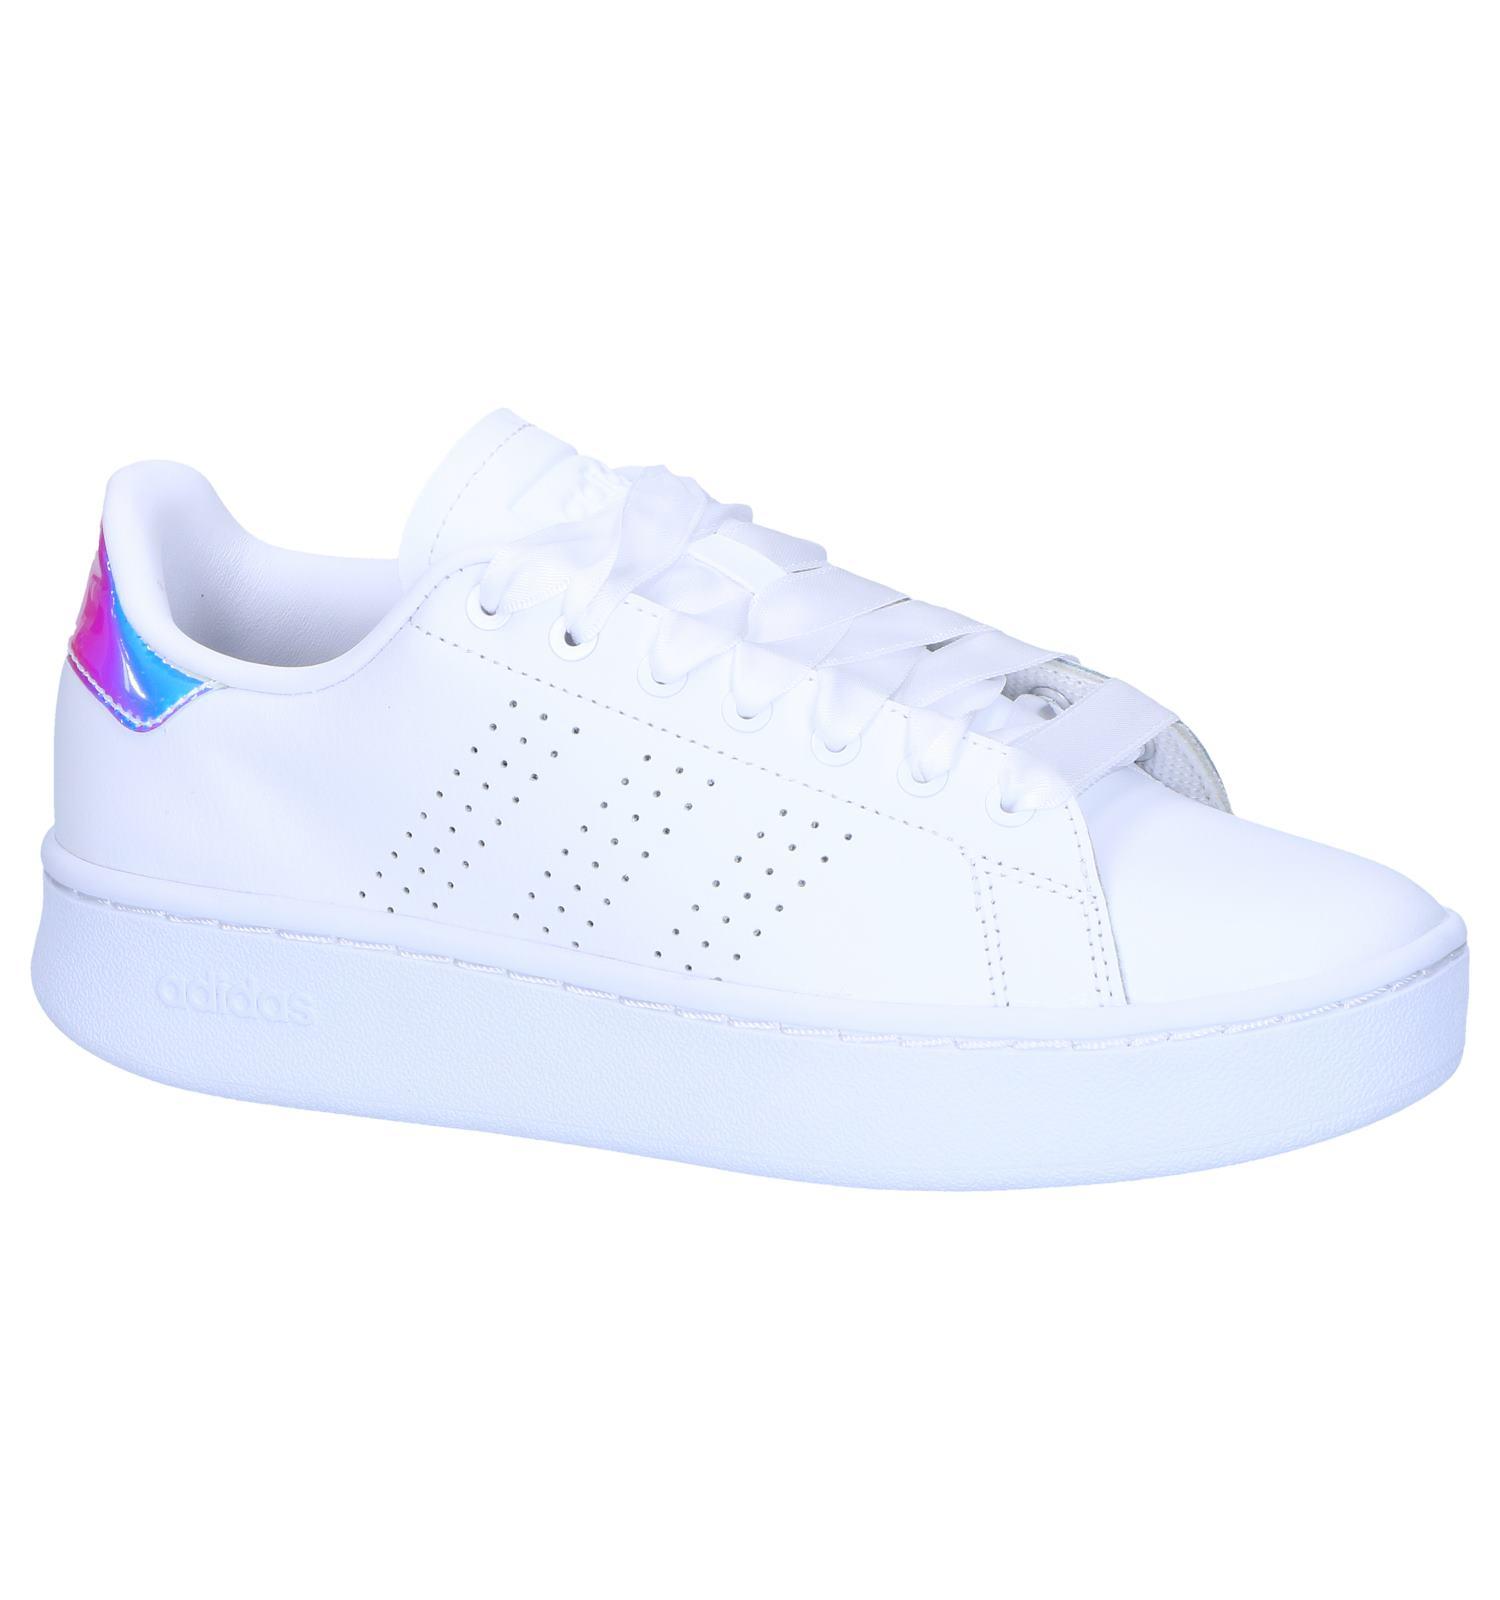 4a6128fb82d Witte Sneakers adidas Advantage Bold | TORFS.BE | Gratis verzend en retour